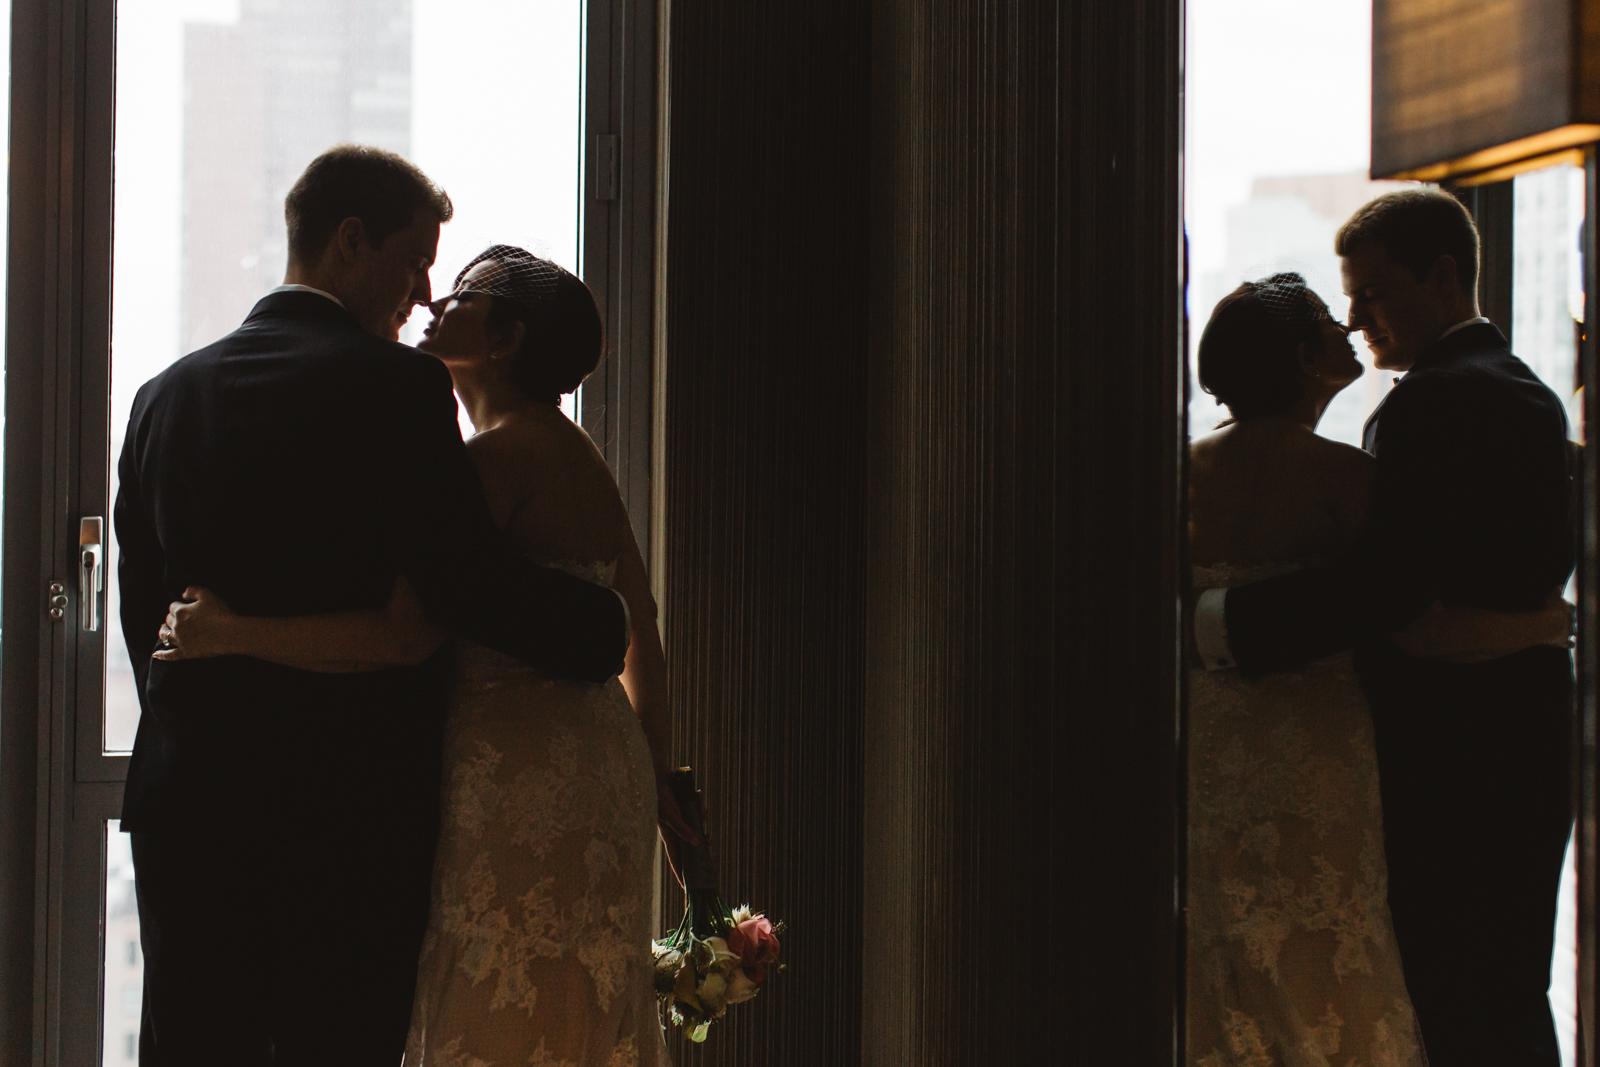 NYC Wedding Photography Lofts at Prince Brooklyn NYC Photographer Boris Zaretsky _B2C7379.jpg